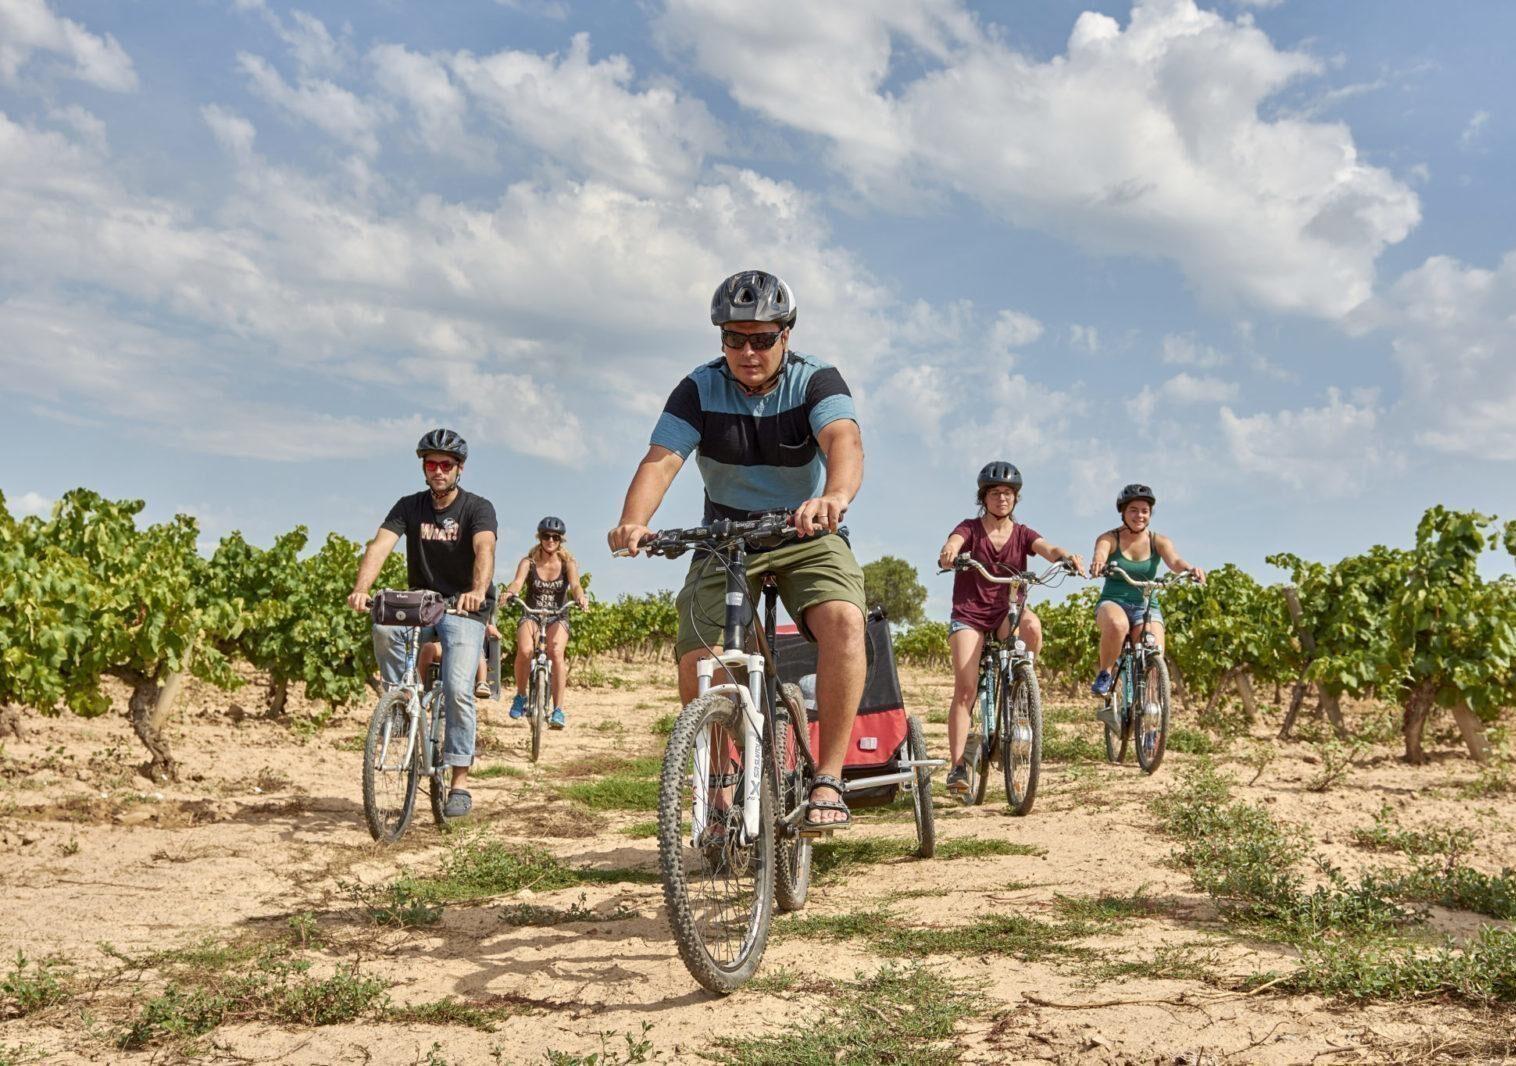 Visita celler de la Carretera del Vi en bicicleta o Ebike (3h)